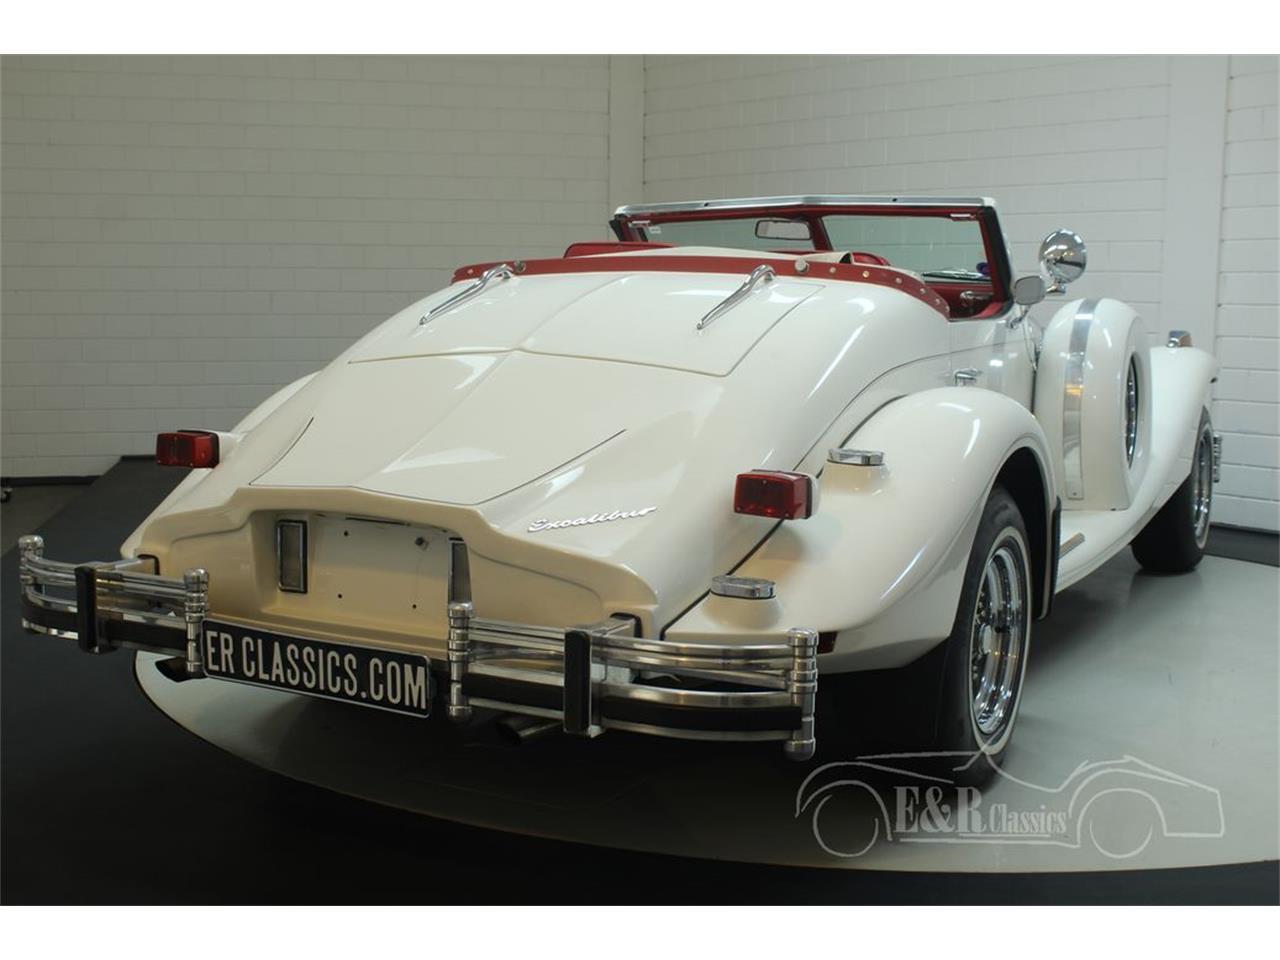 1982 Excalibur Series IV Phaeton (CC-1411834) for sale in Waalwijk, Noord-Brabant